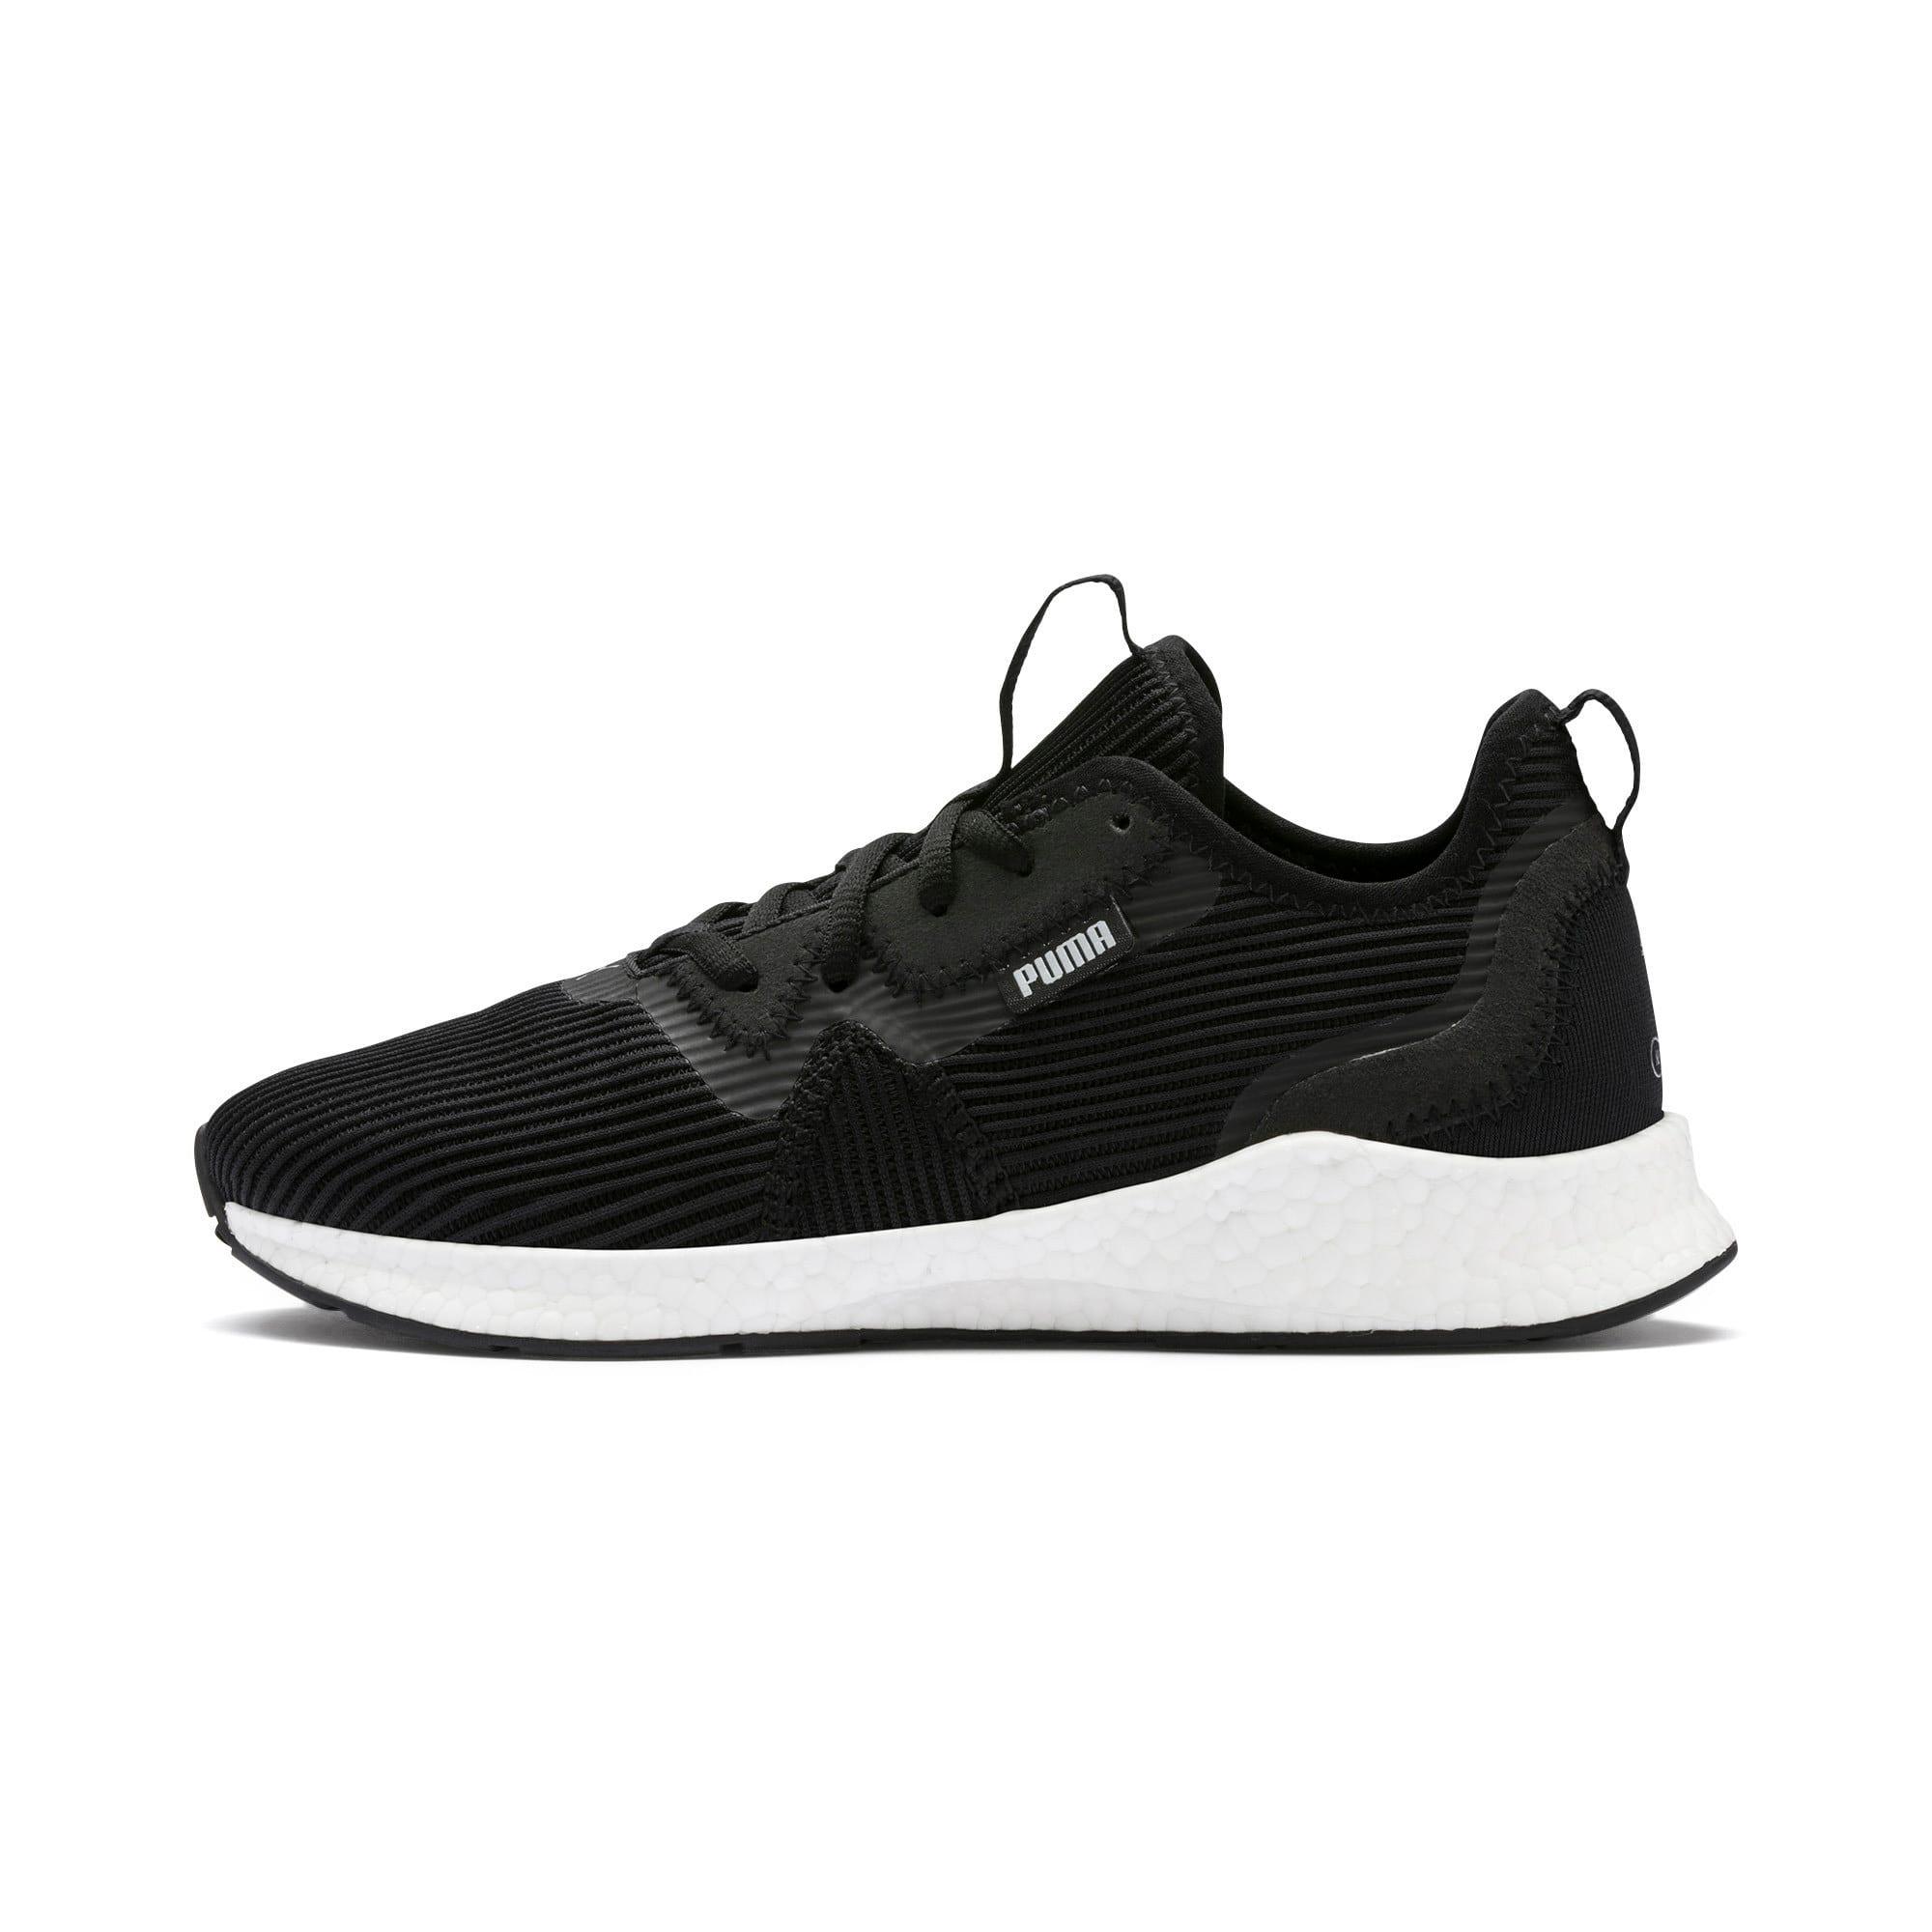 tout neuf b44b4 c9924 NRGY Star Femme Women's Running Shoes